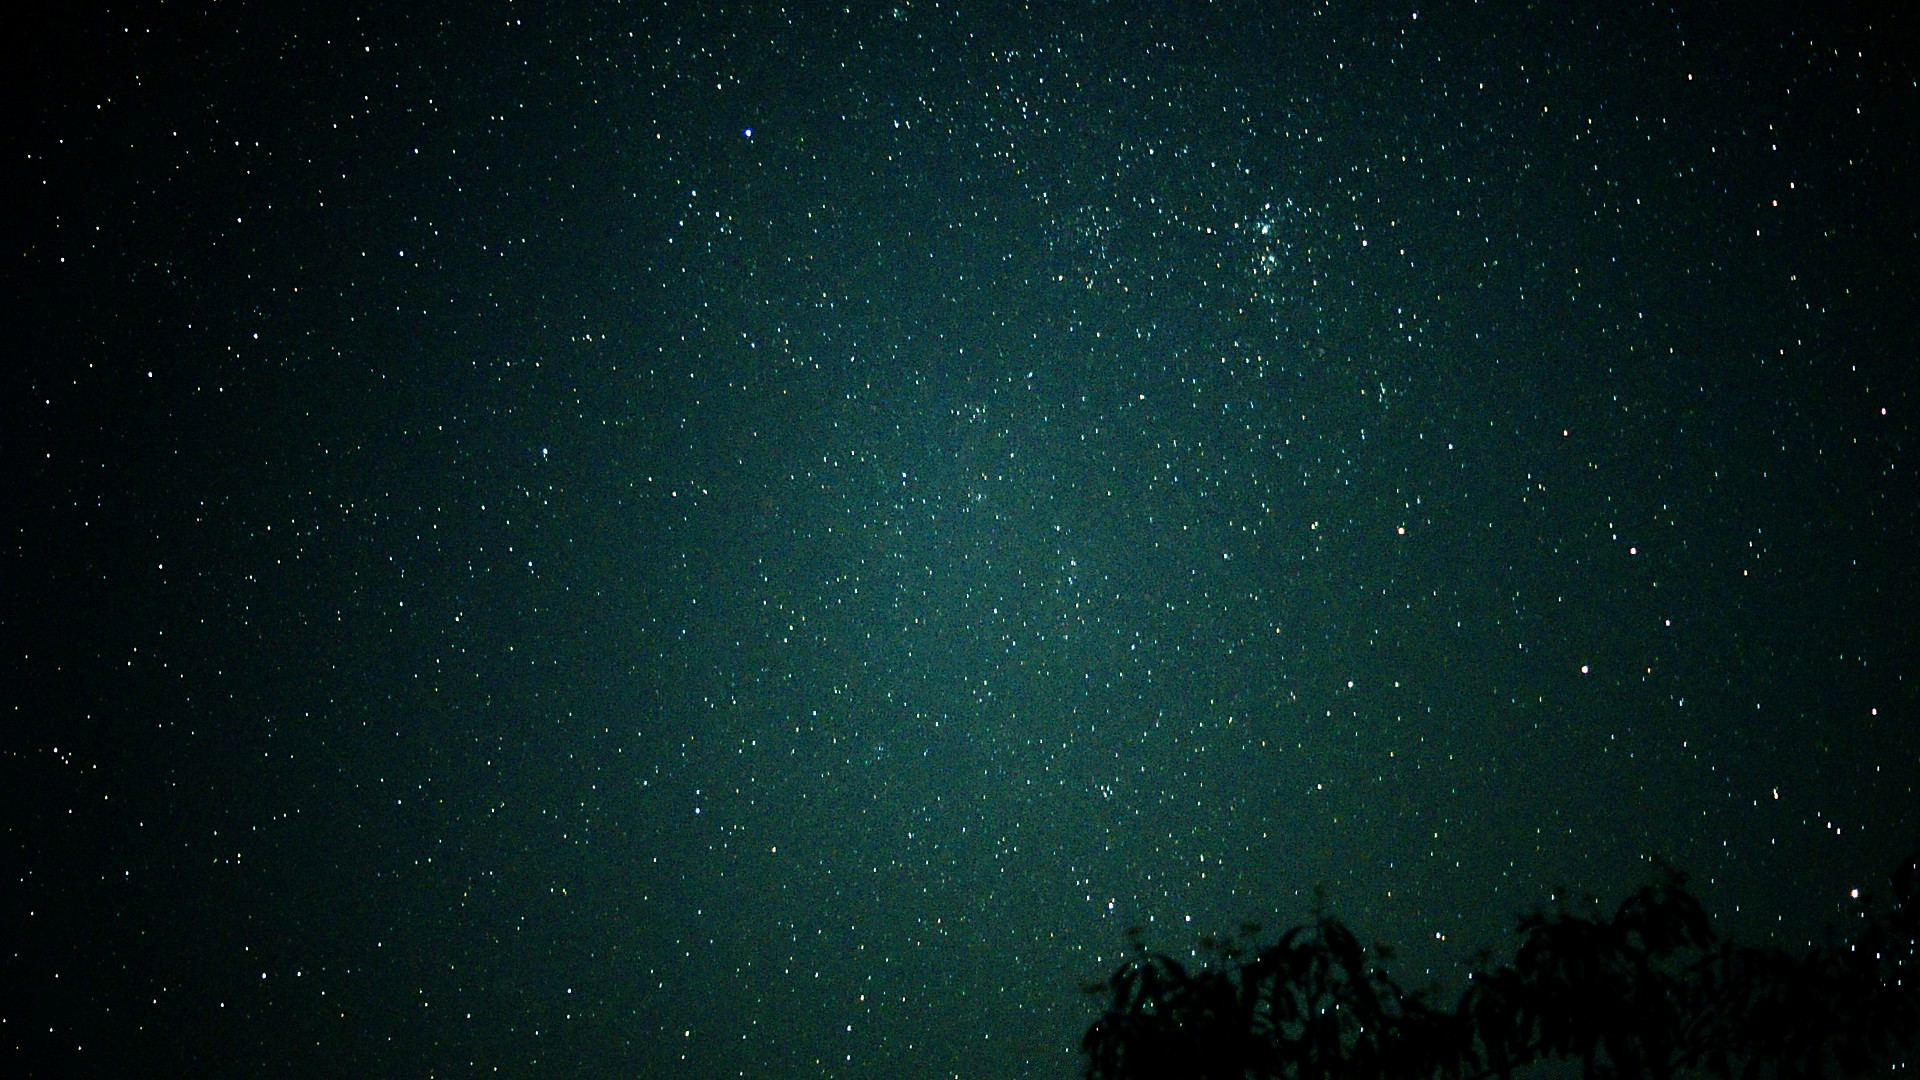 Pc用星 月 宇宙の壁紙 19 1080 31 Wallpaperbox